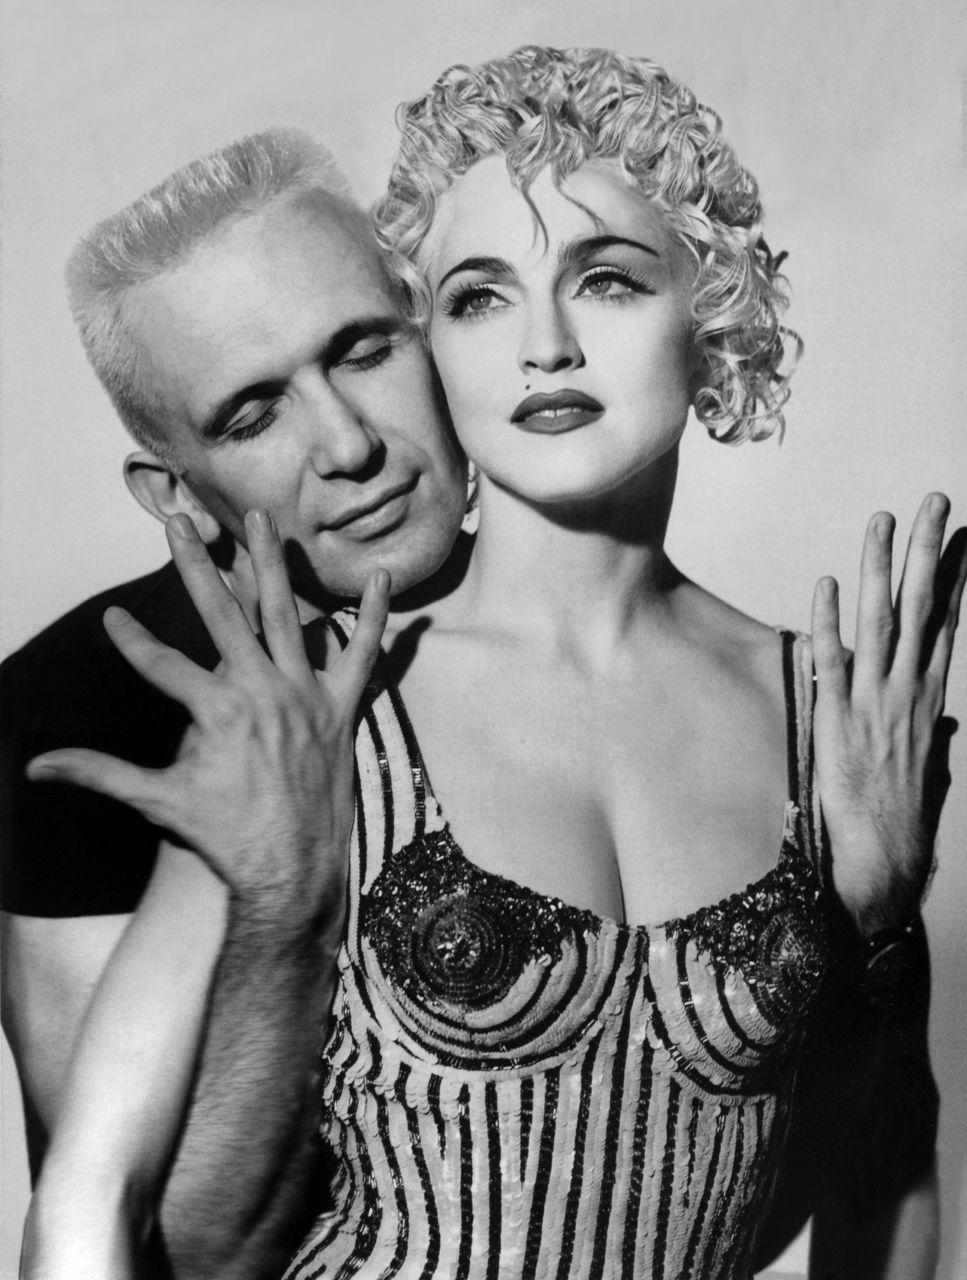 jean-paul gaultier and madonna. | Jean paul gaultier, Madonna, Glamour france